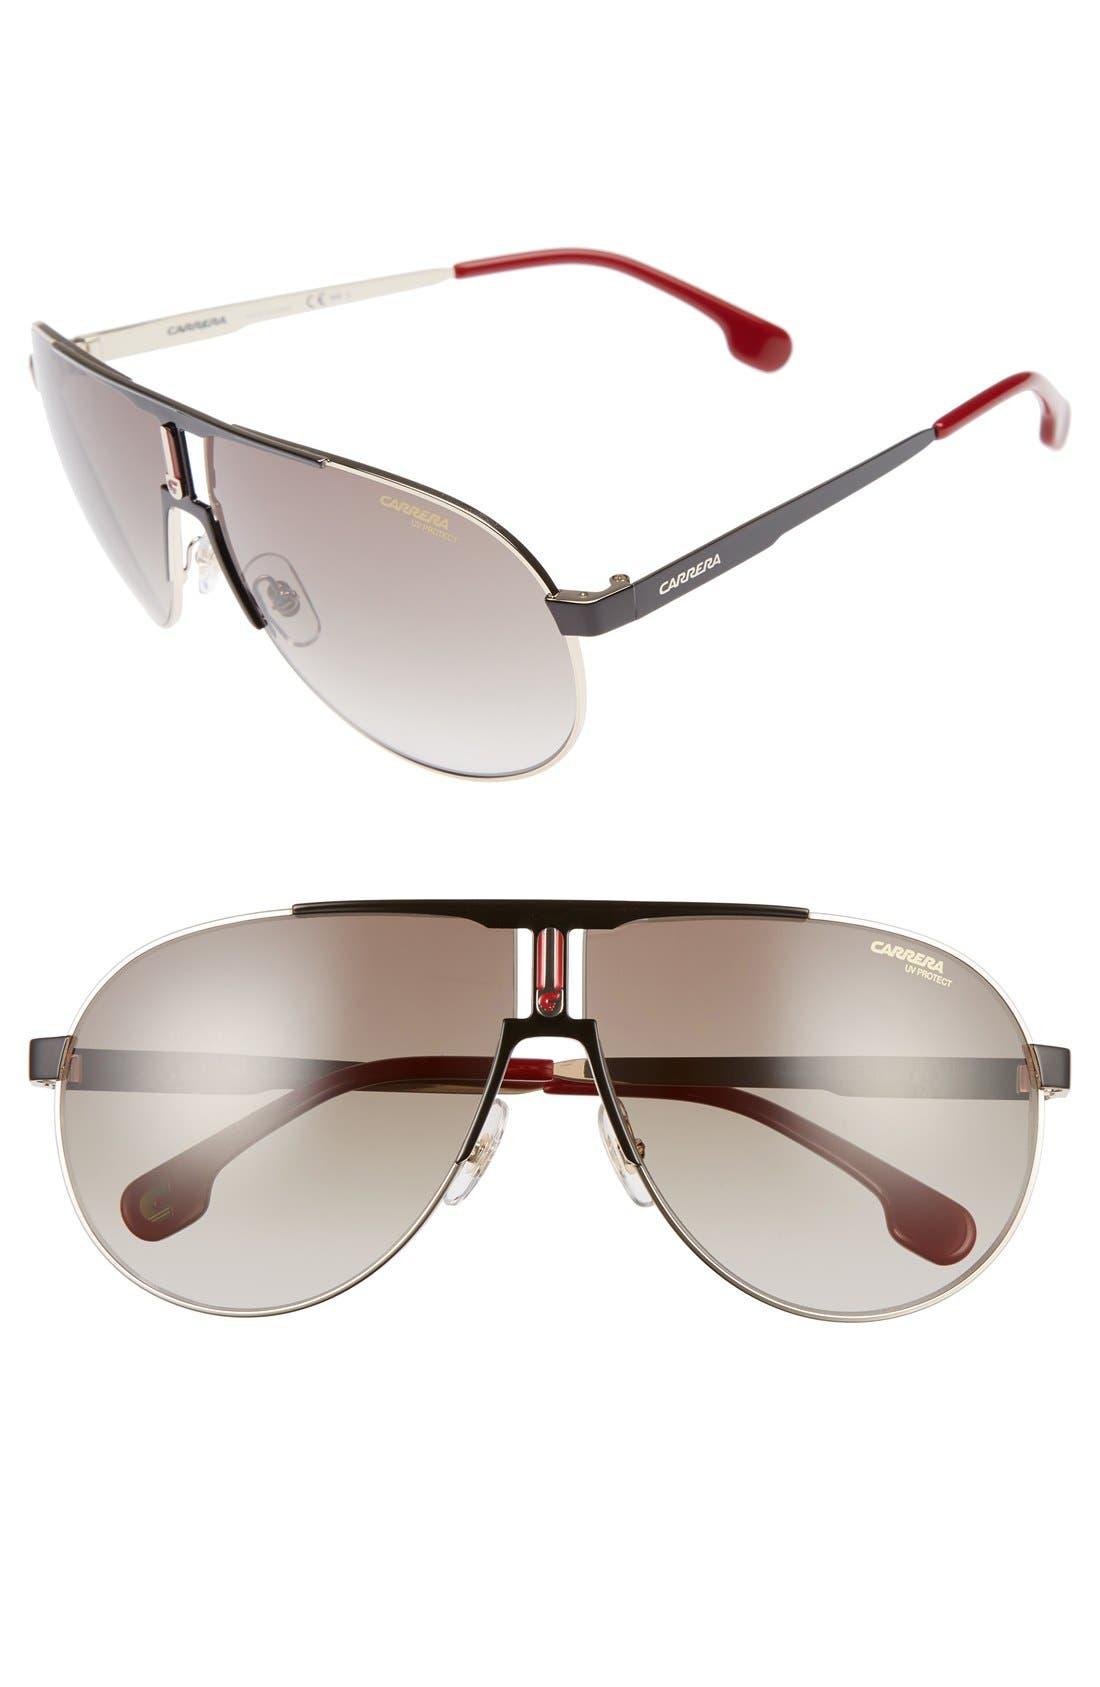 66mm Aviator Sunglasses,                             Main thumbnail 1, color,                             001